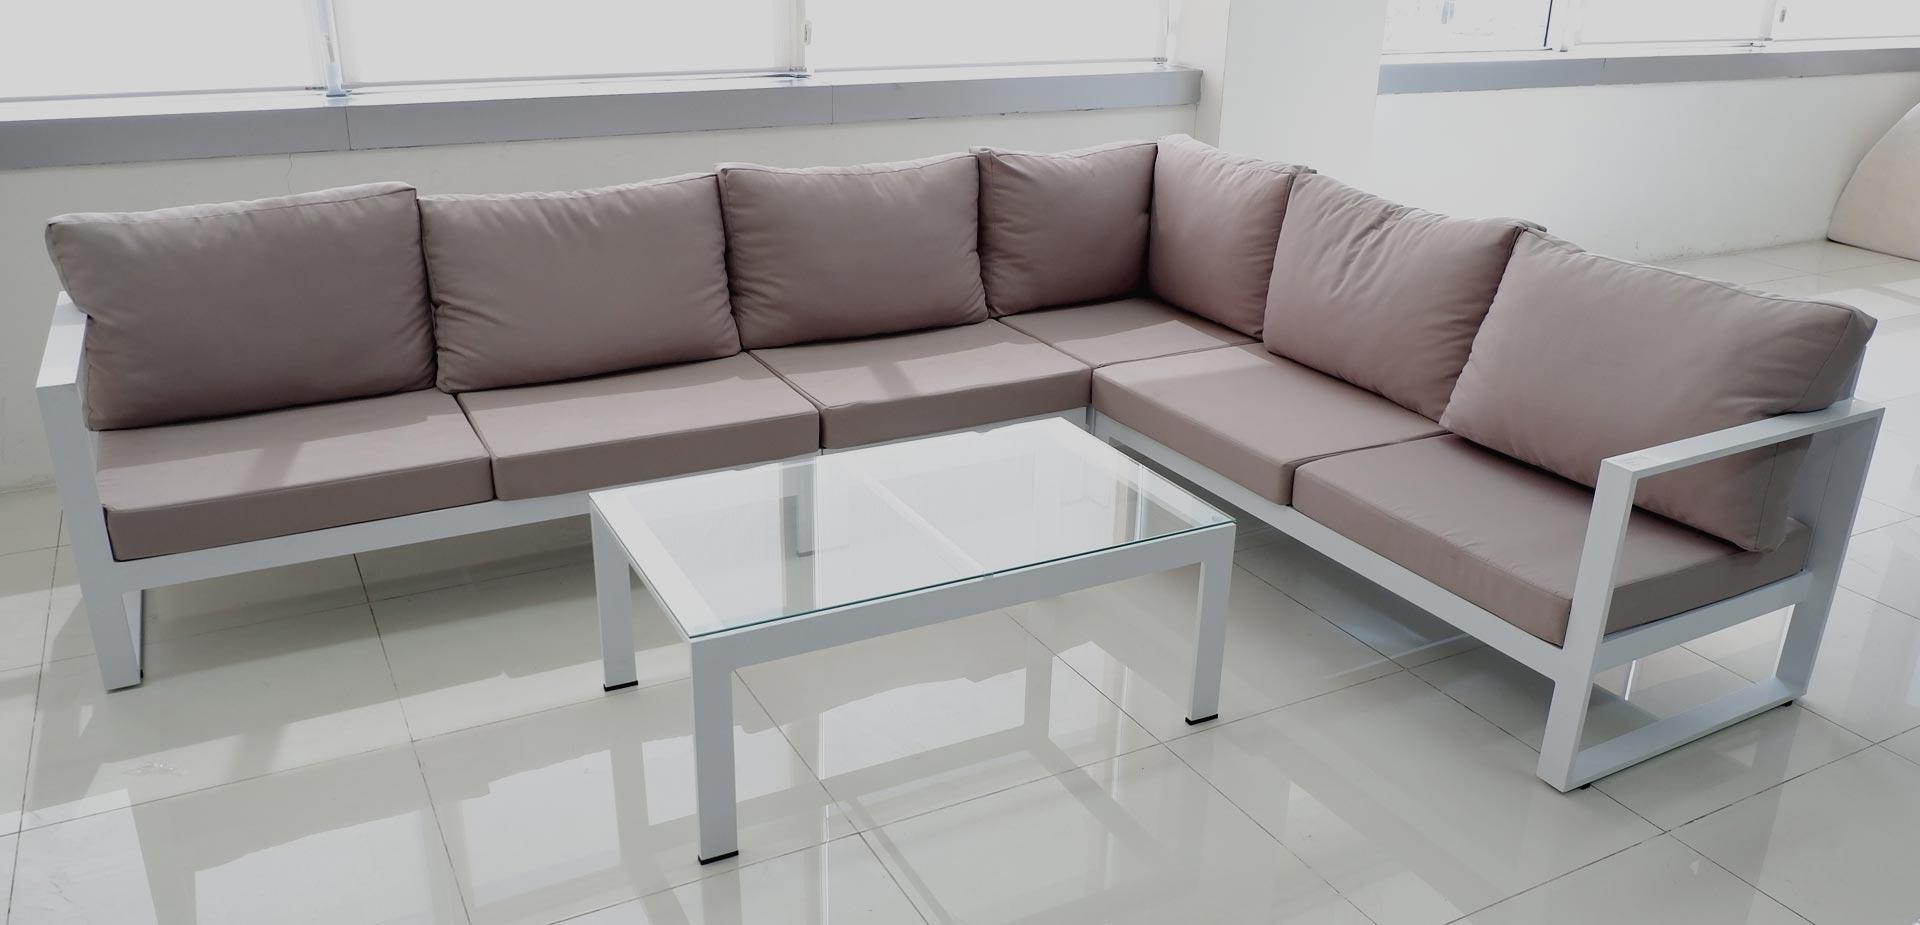 alcomex-indo-aluminium-laquer-furniture-extrusion-finished-goods-homeslide-5